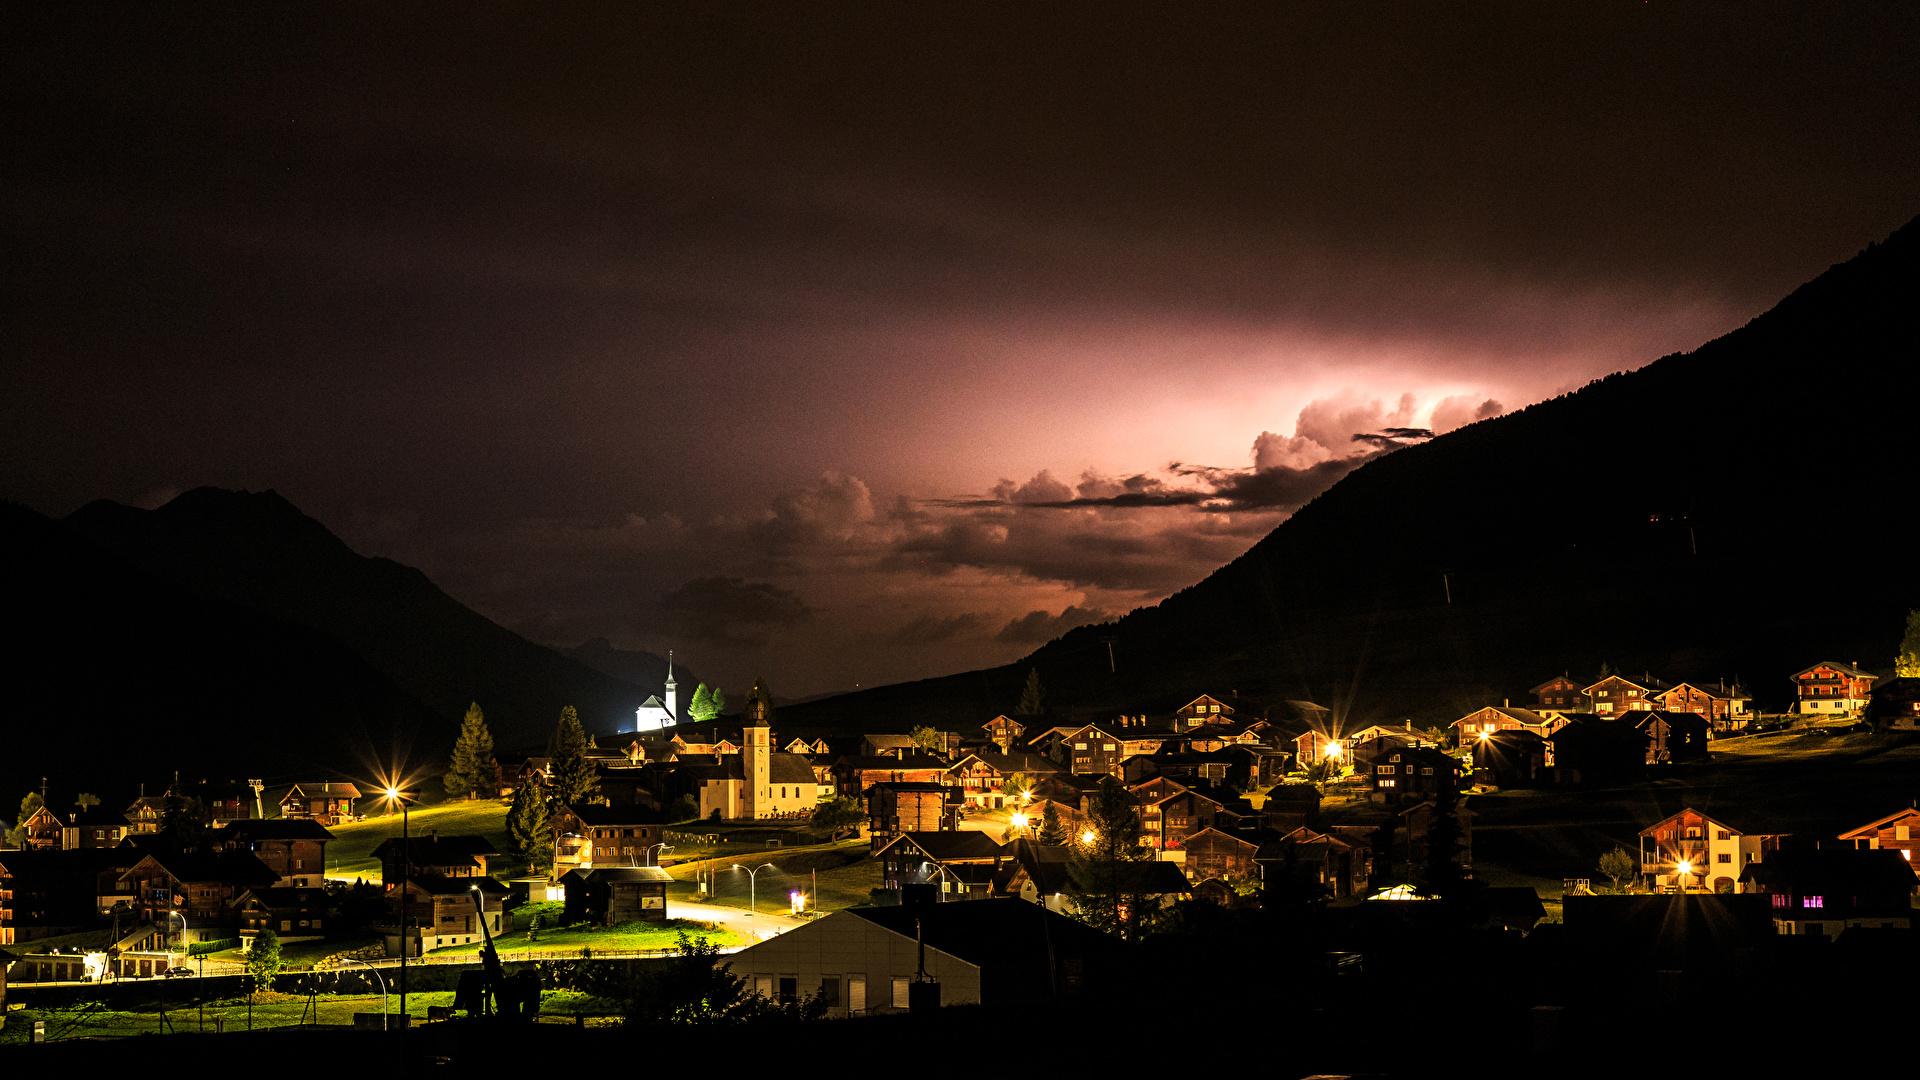 Picture Switzerland Wetterleuchten Gluringen mountain night time Houses Cities 1920x1080 Mountains Night Building